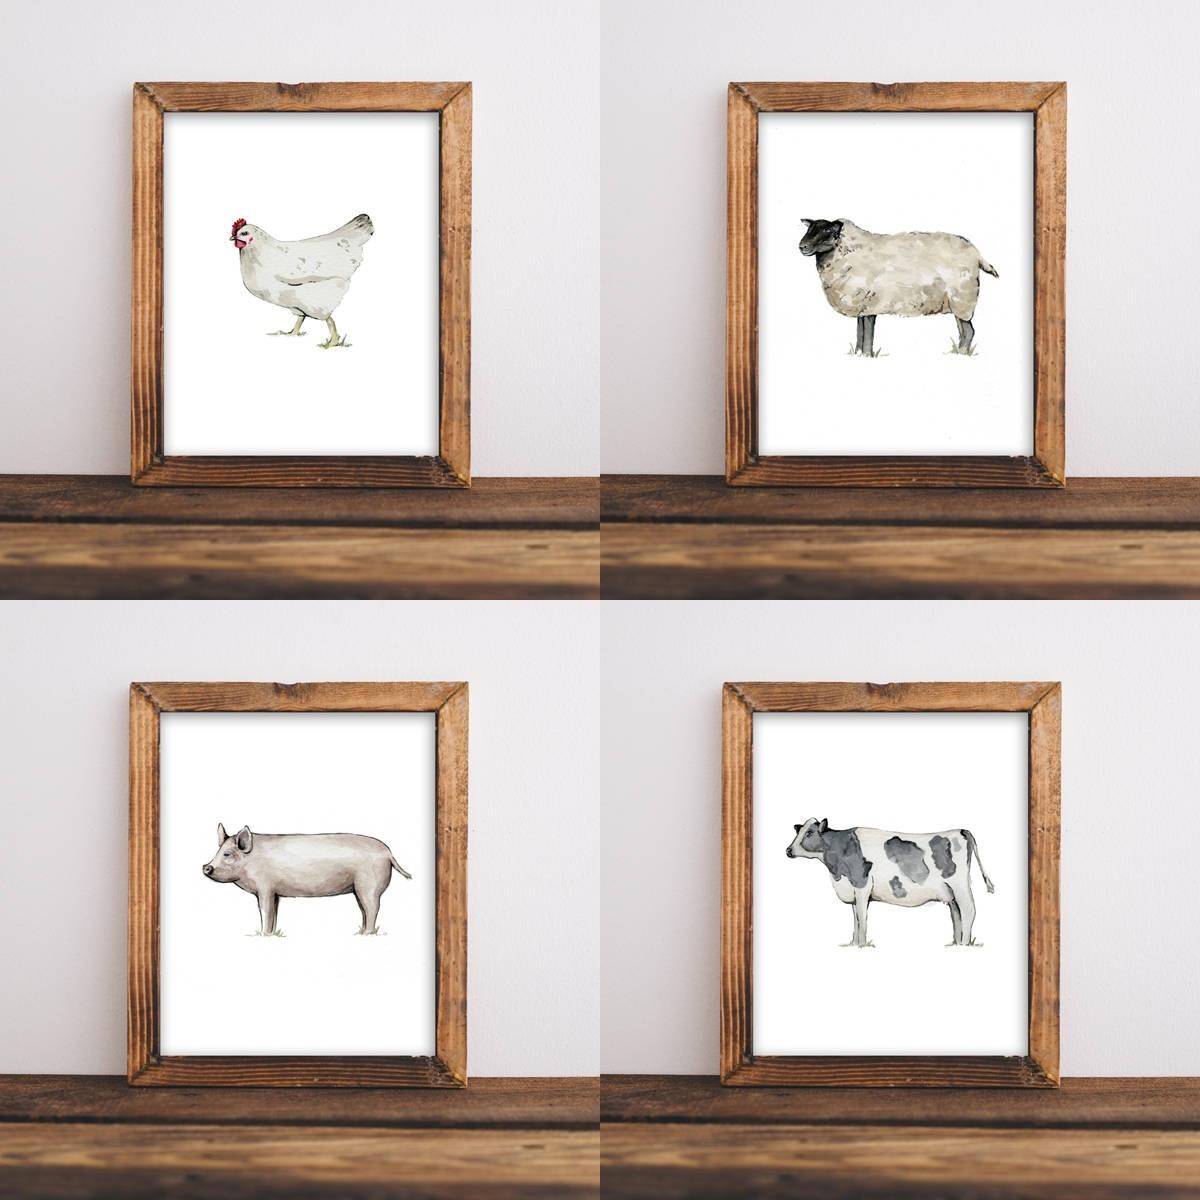 Trendy Farmhouse Wall Art With Farmhouse Wall Art, Nursery Wall Art, Shabby Chic Wall Art, Animal (View 14 of 15)